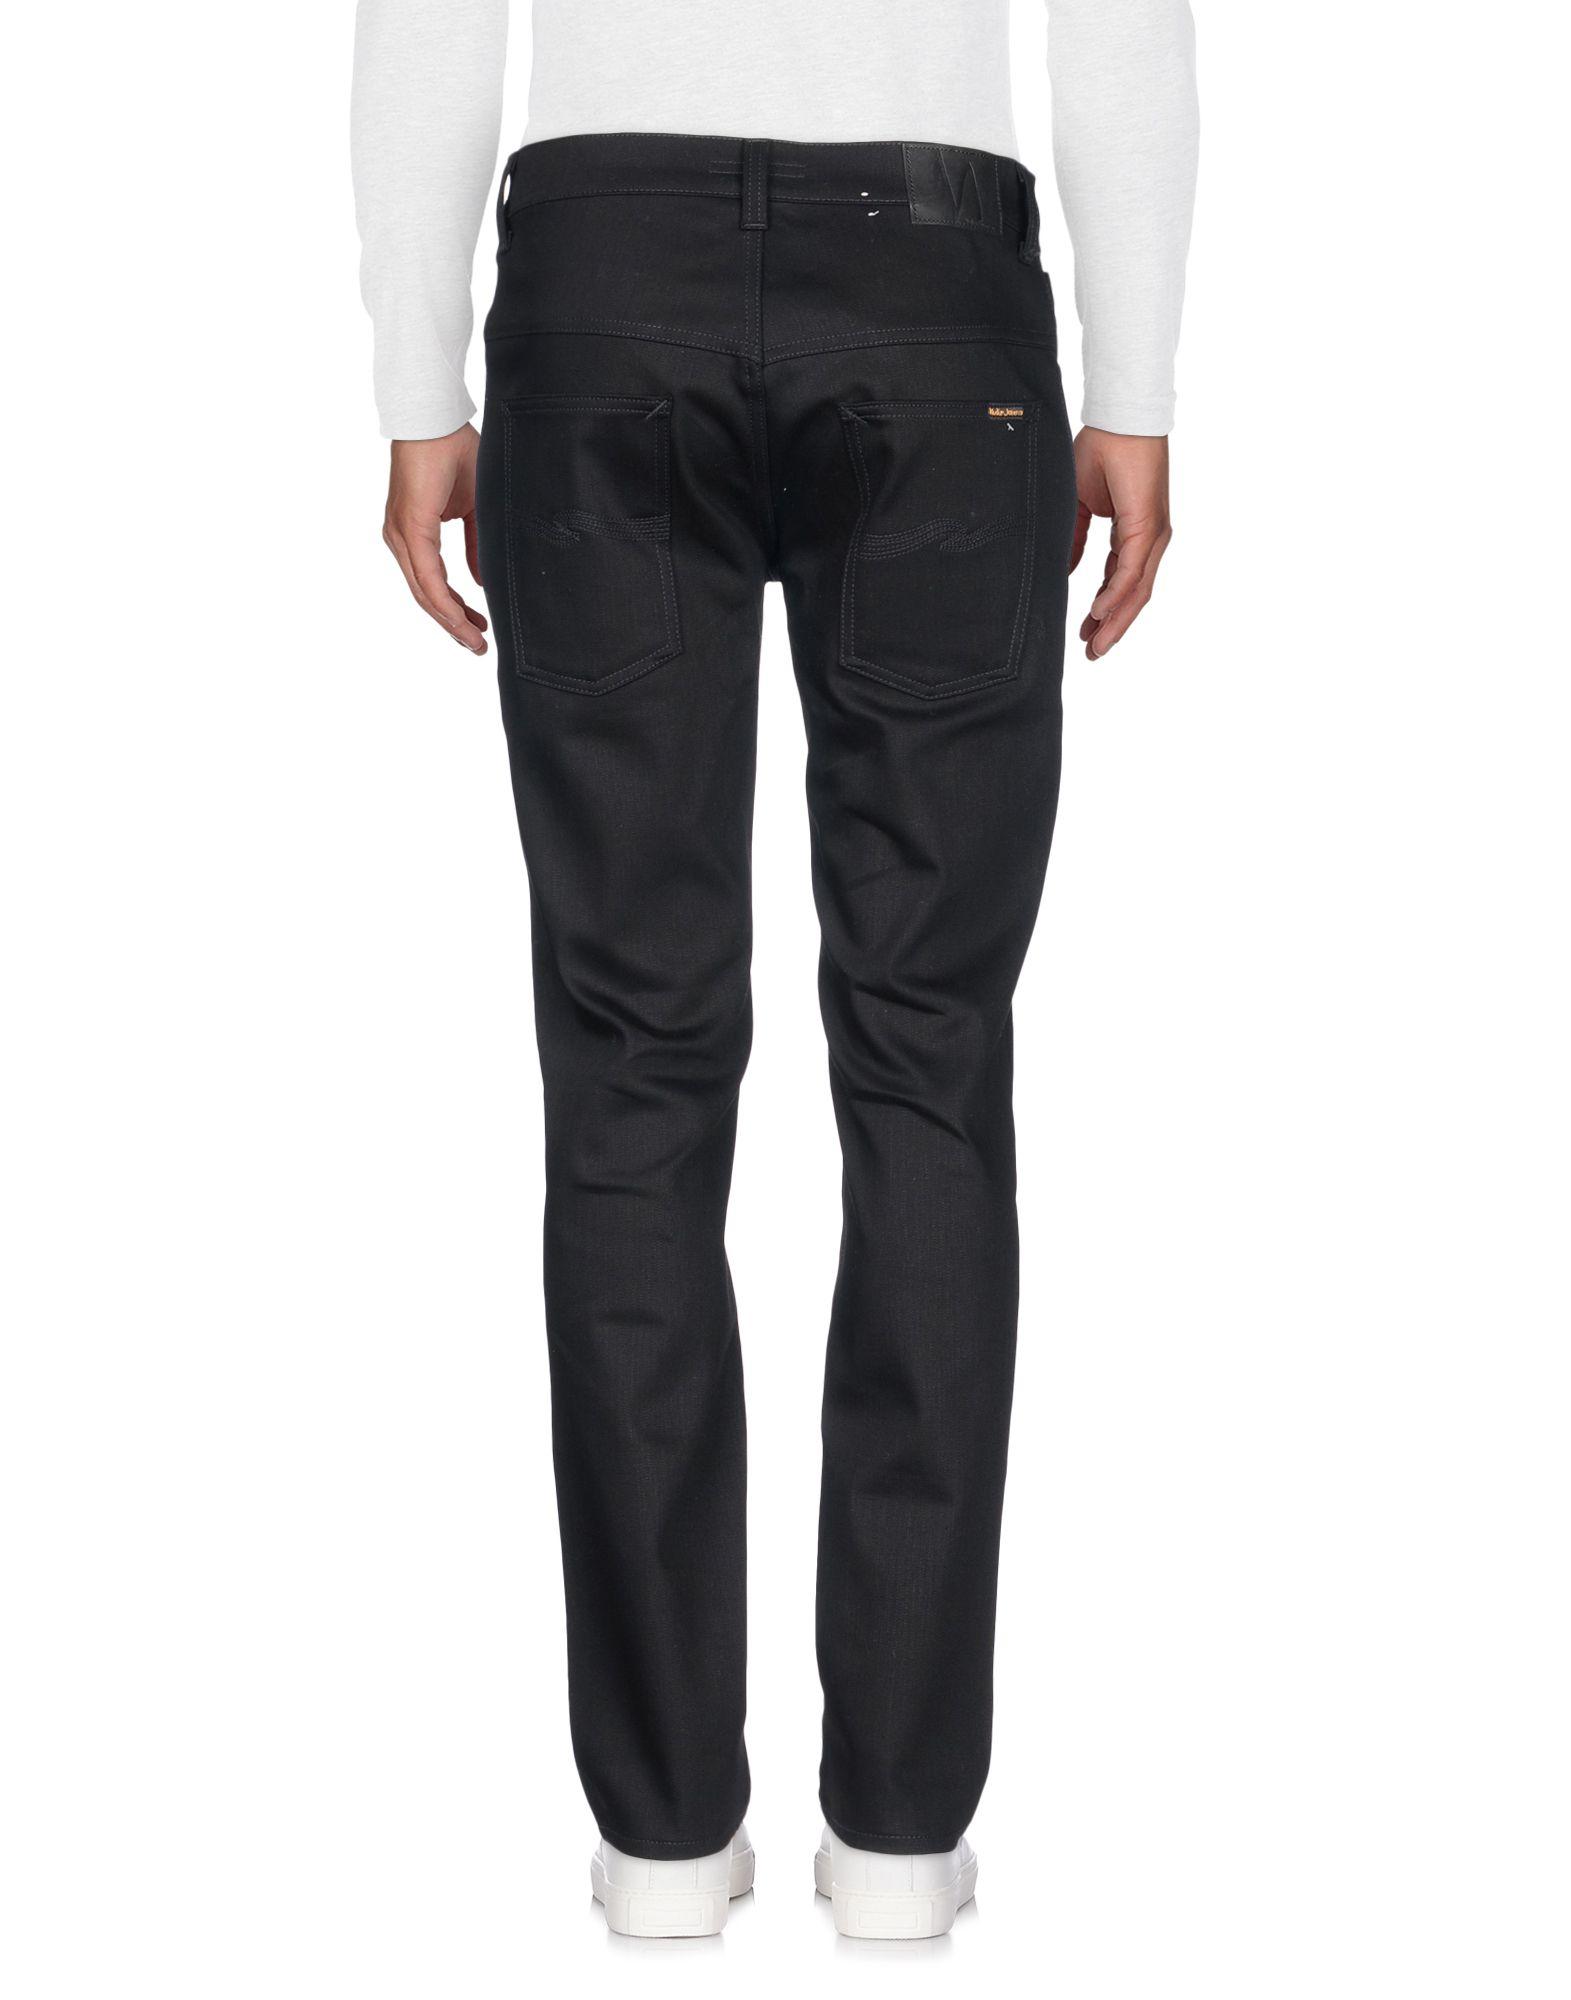 Pantaloni Jeans Nudie Jeans Co Uomo - 42679565ER 42679565ER - 8b3ad6